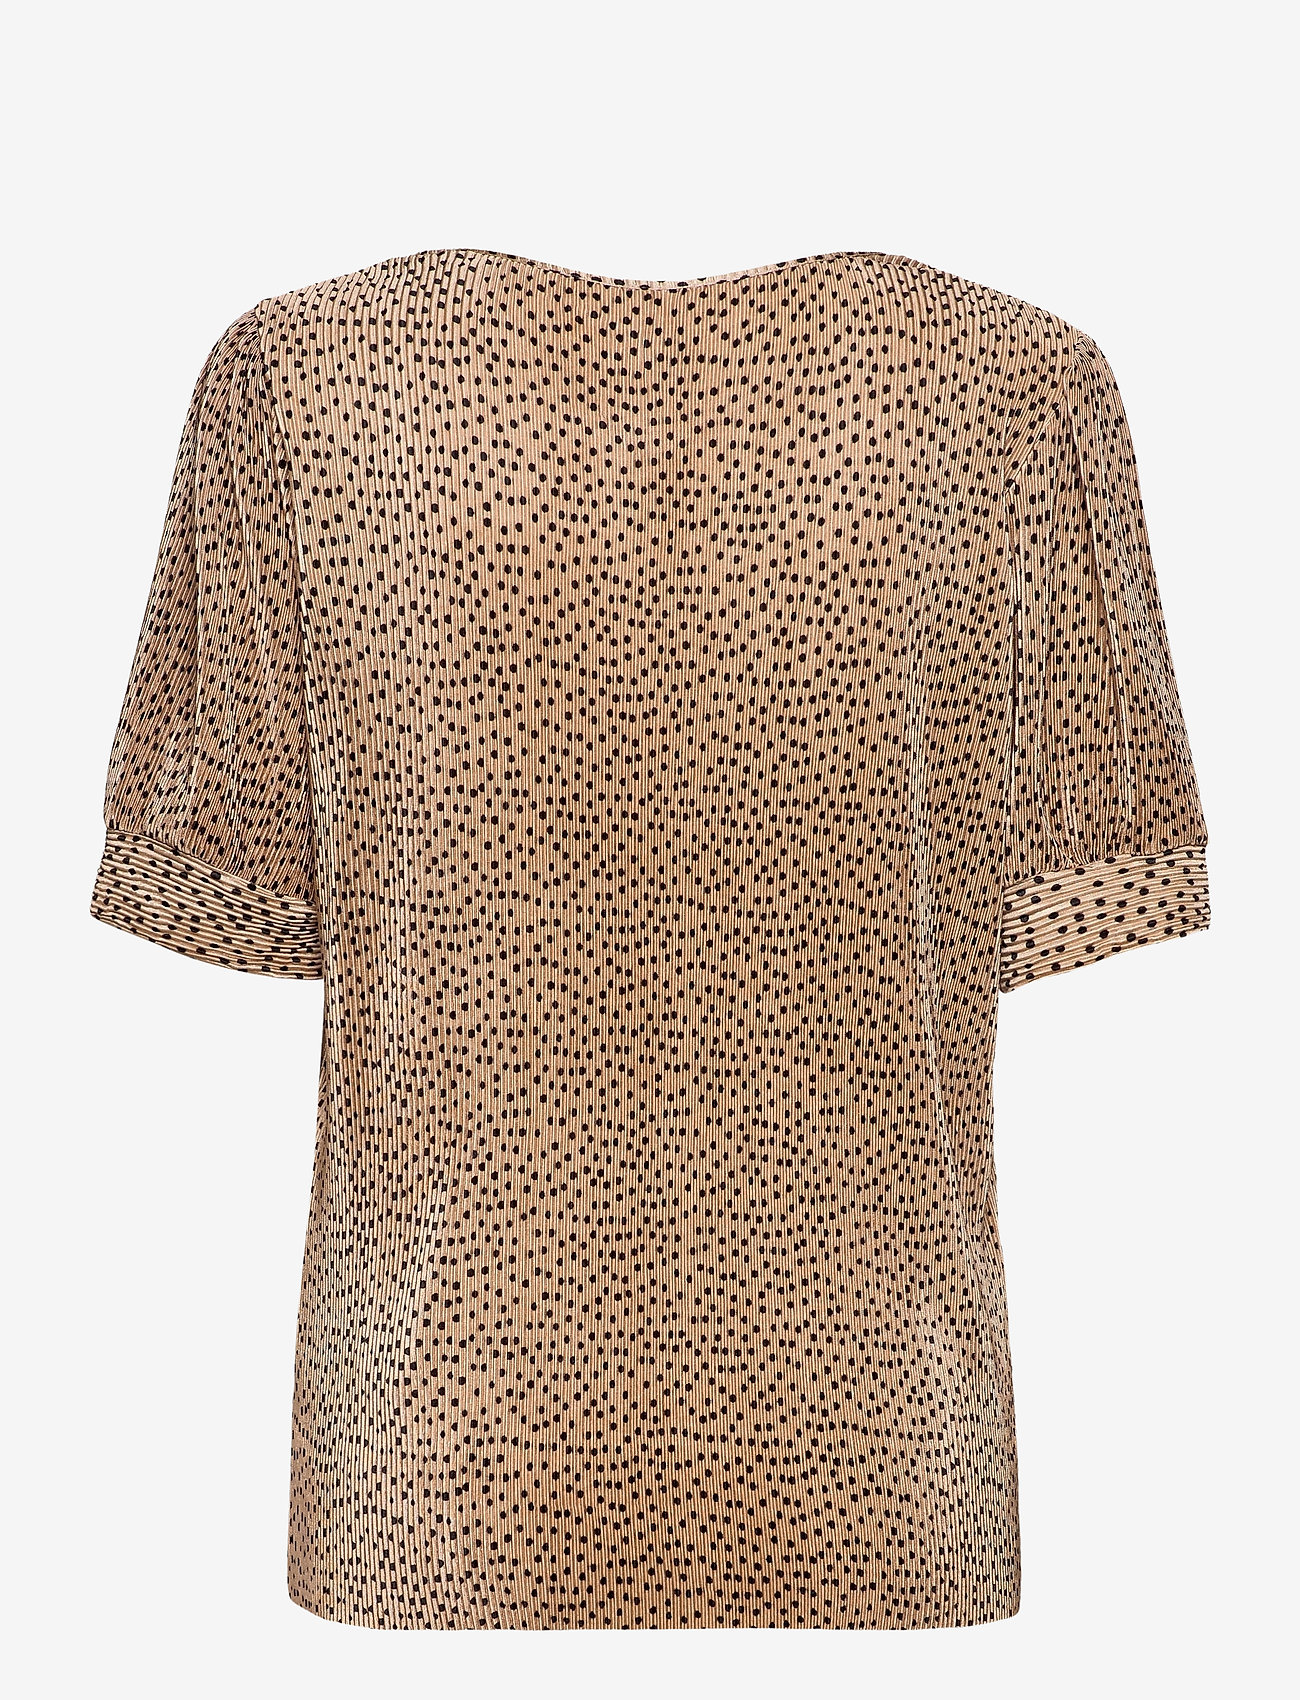 Soyaconcept - SC-NELLIE - short-sleeved blouses - camel combi - 1